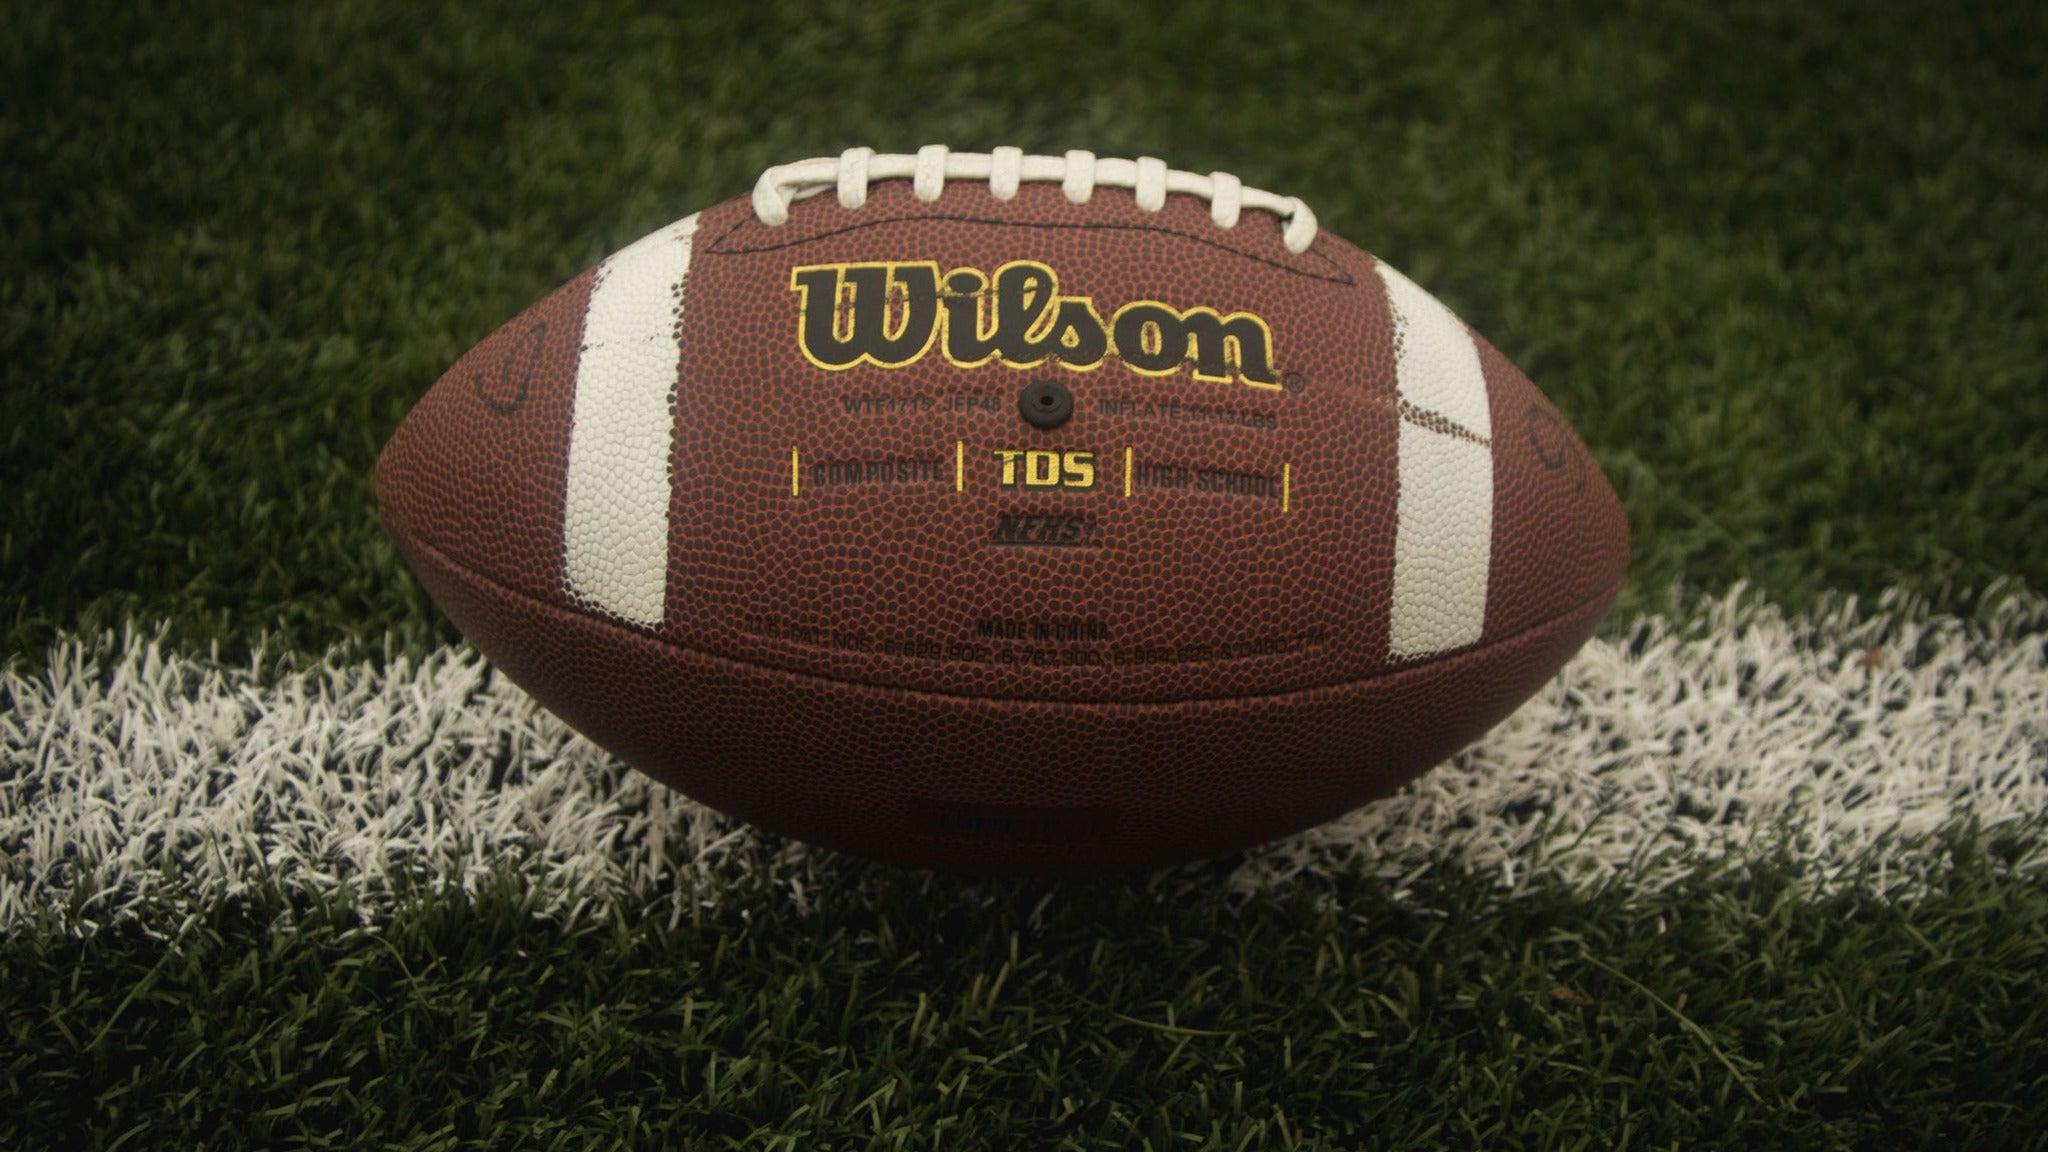 Baylor Bears Football vs. Stephen F Austin Lumberjacks Football